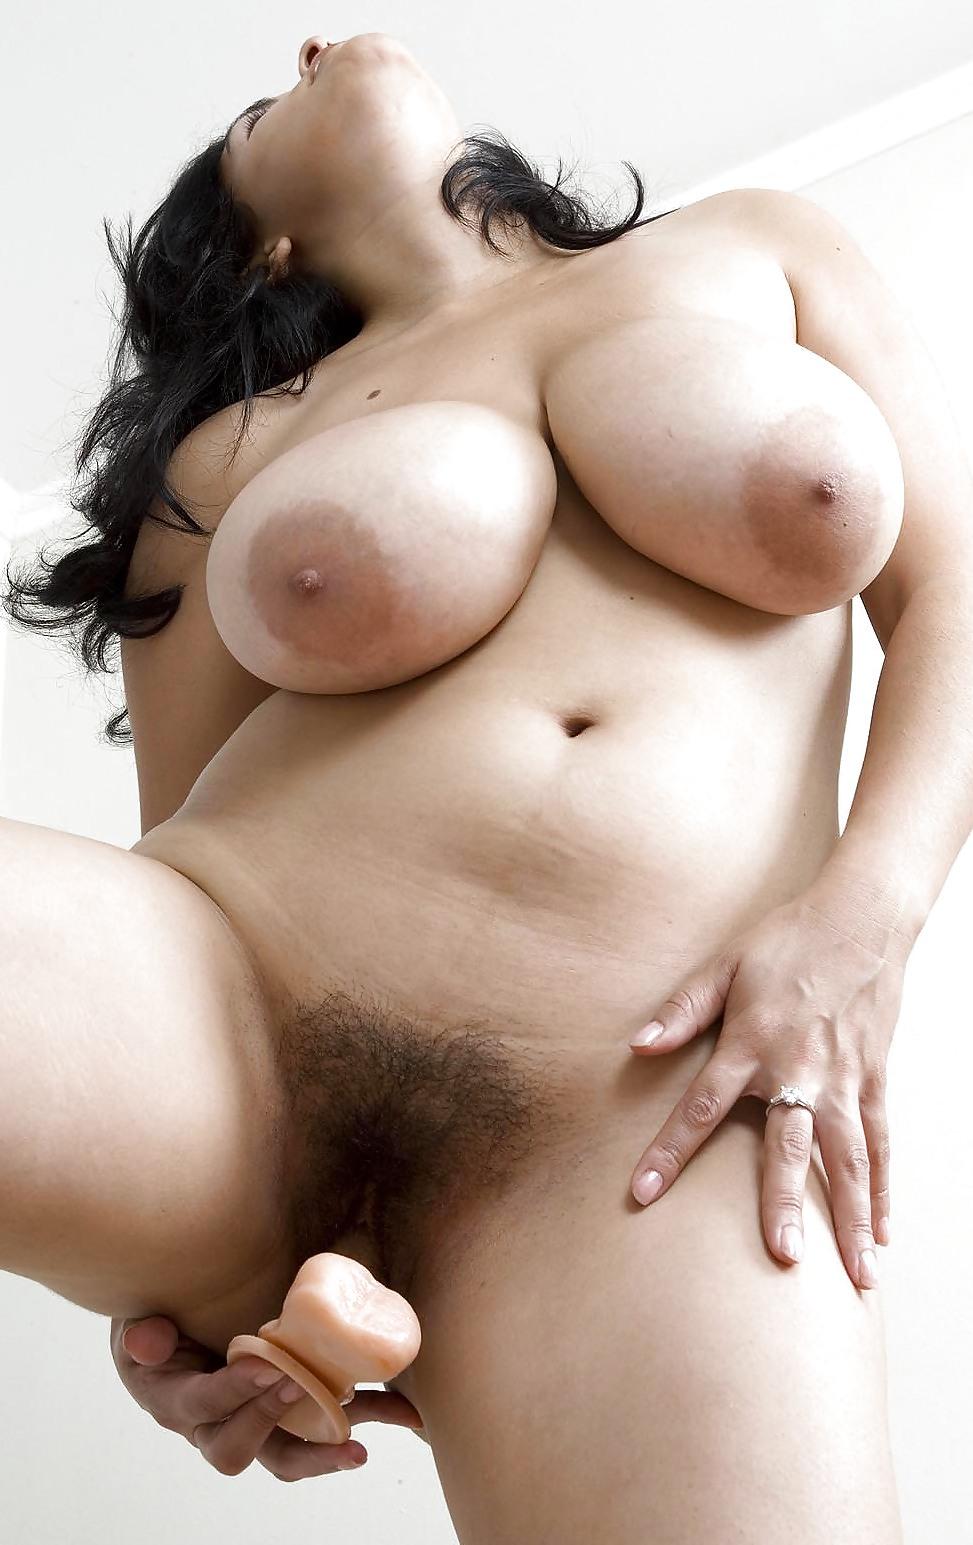 Rare early interracial porn pics